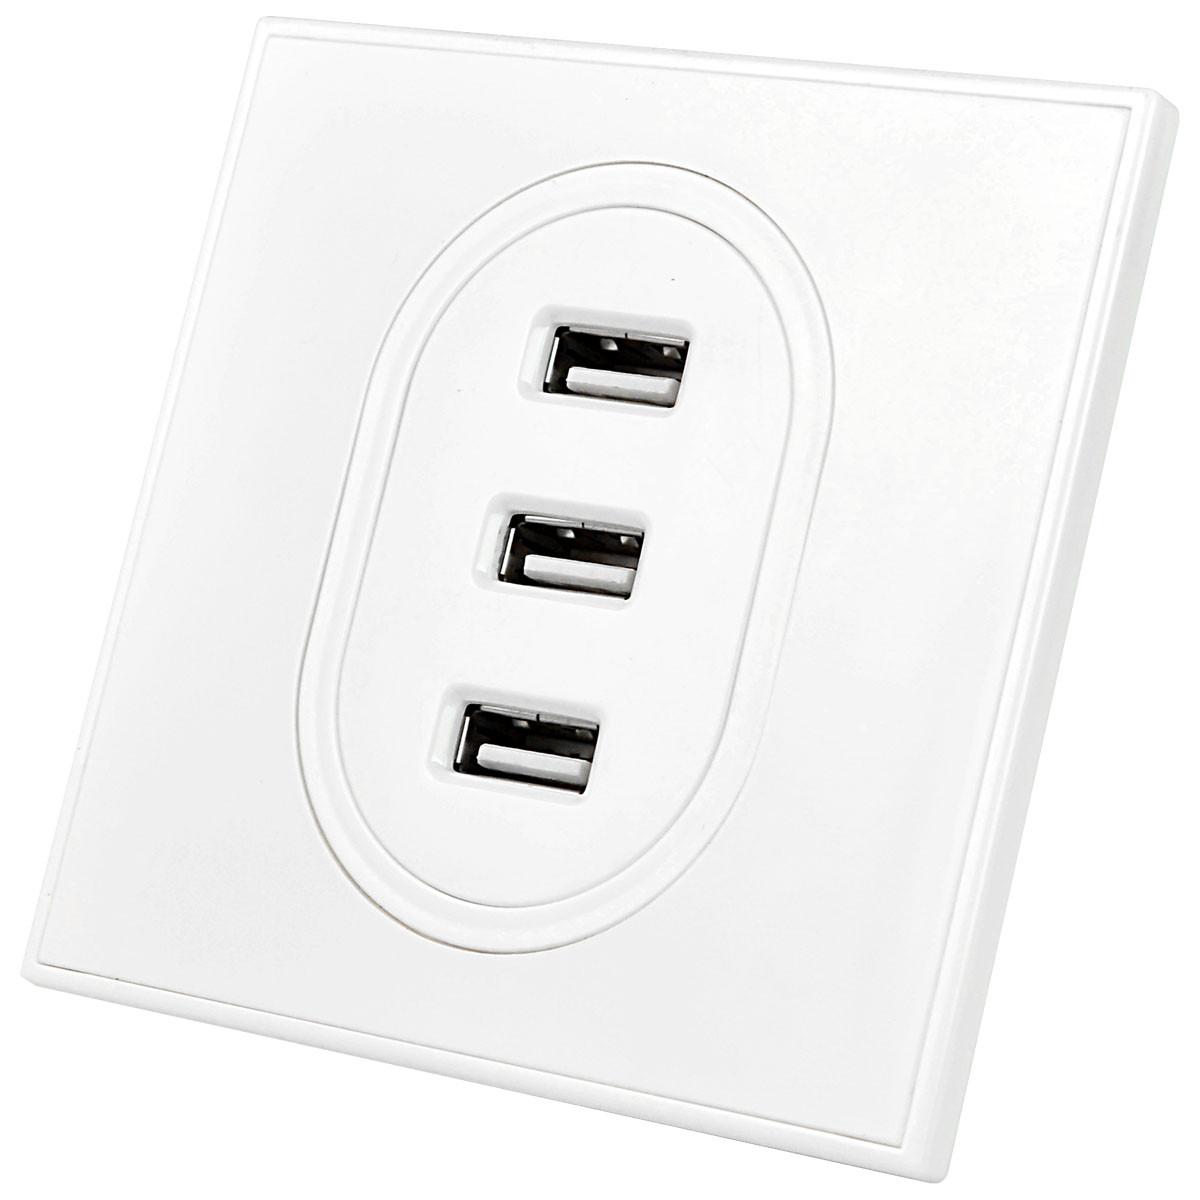 3 USB Charging Wall Socket (Input: AC 100-240V / 10A, USB